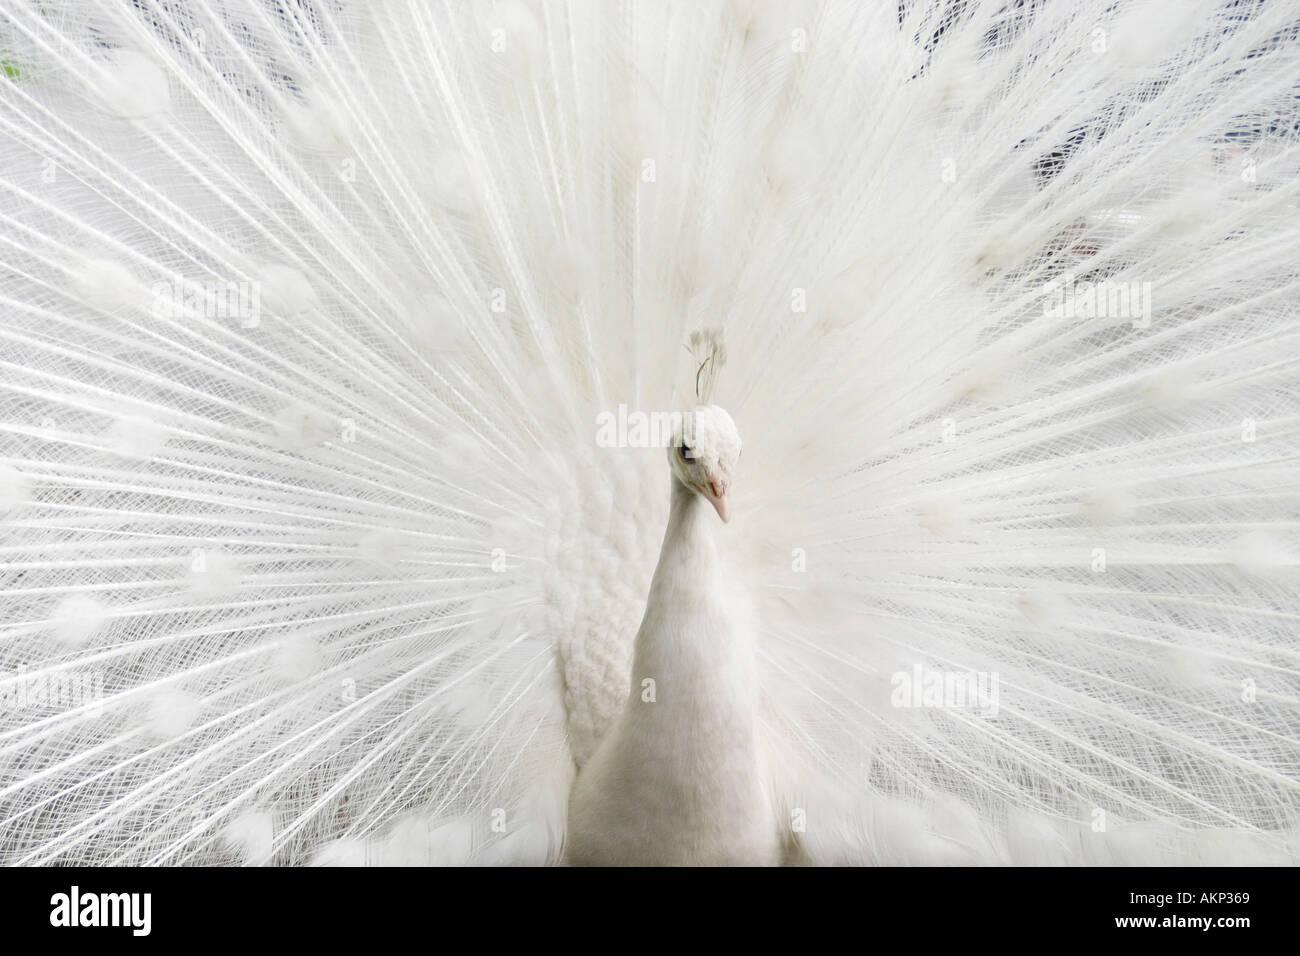 peacock 2 - Stock Image